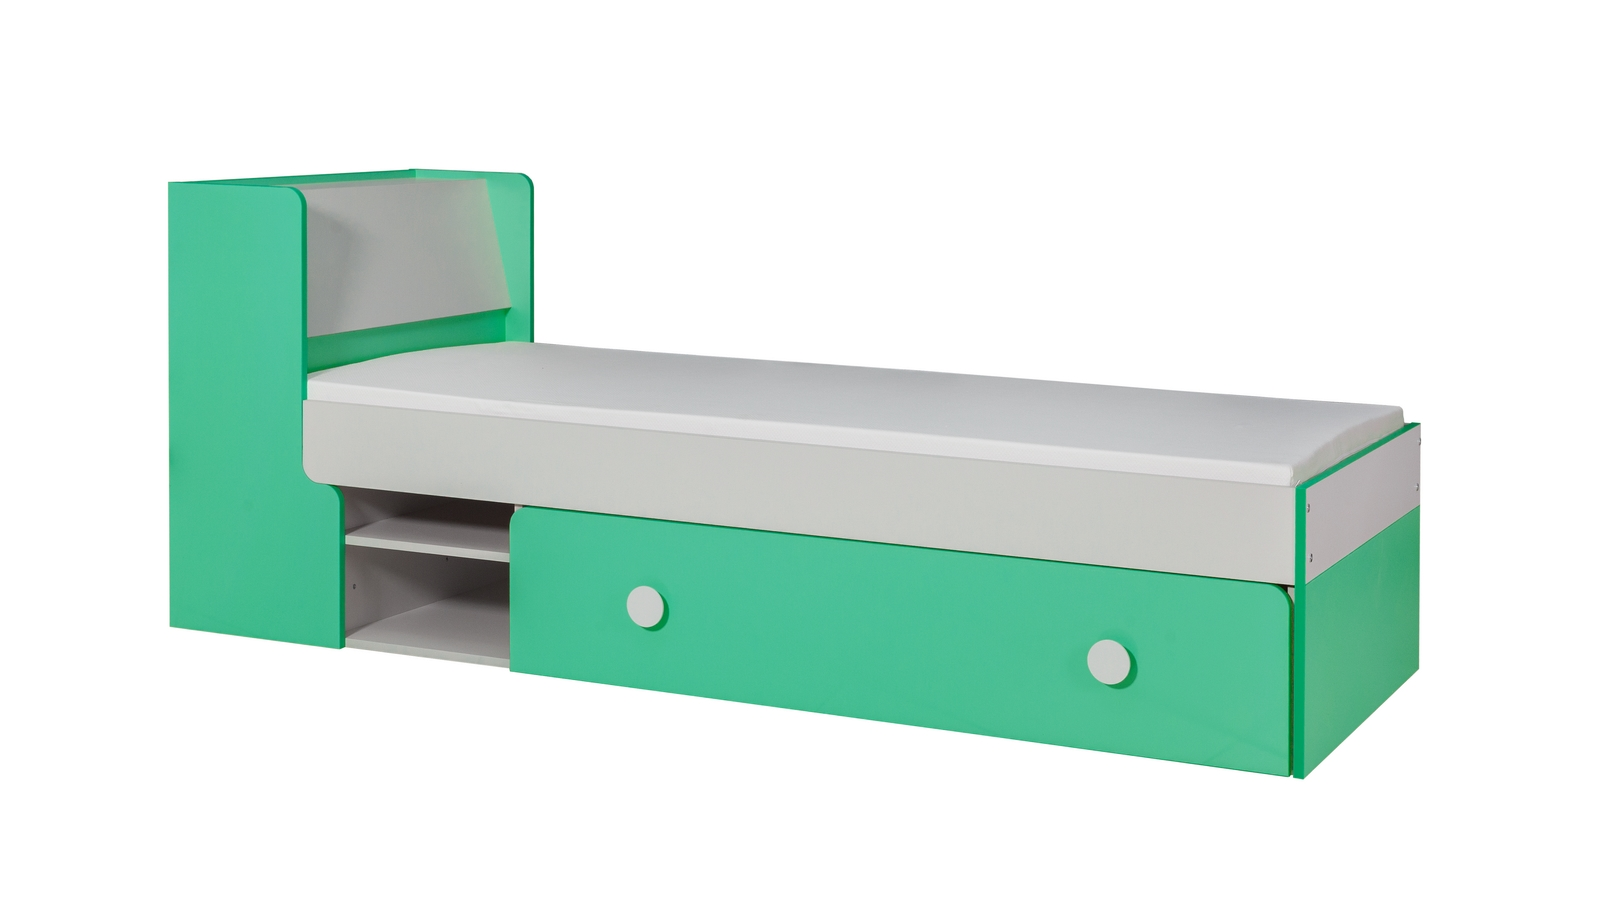 Jednolôžková posteľ 80 cm - MOB - Yan 13 (s roštom)